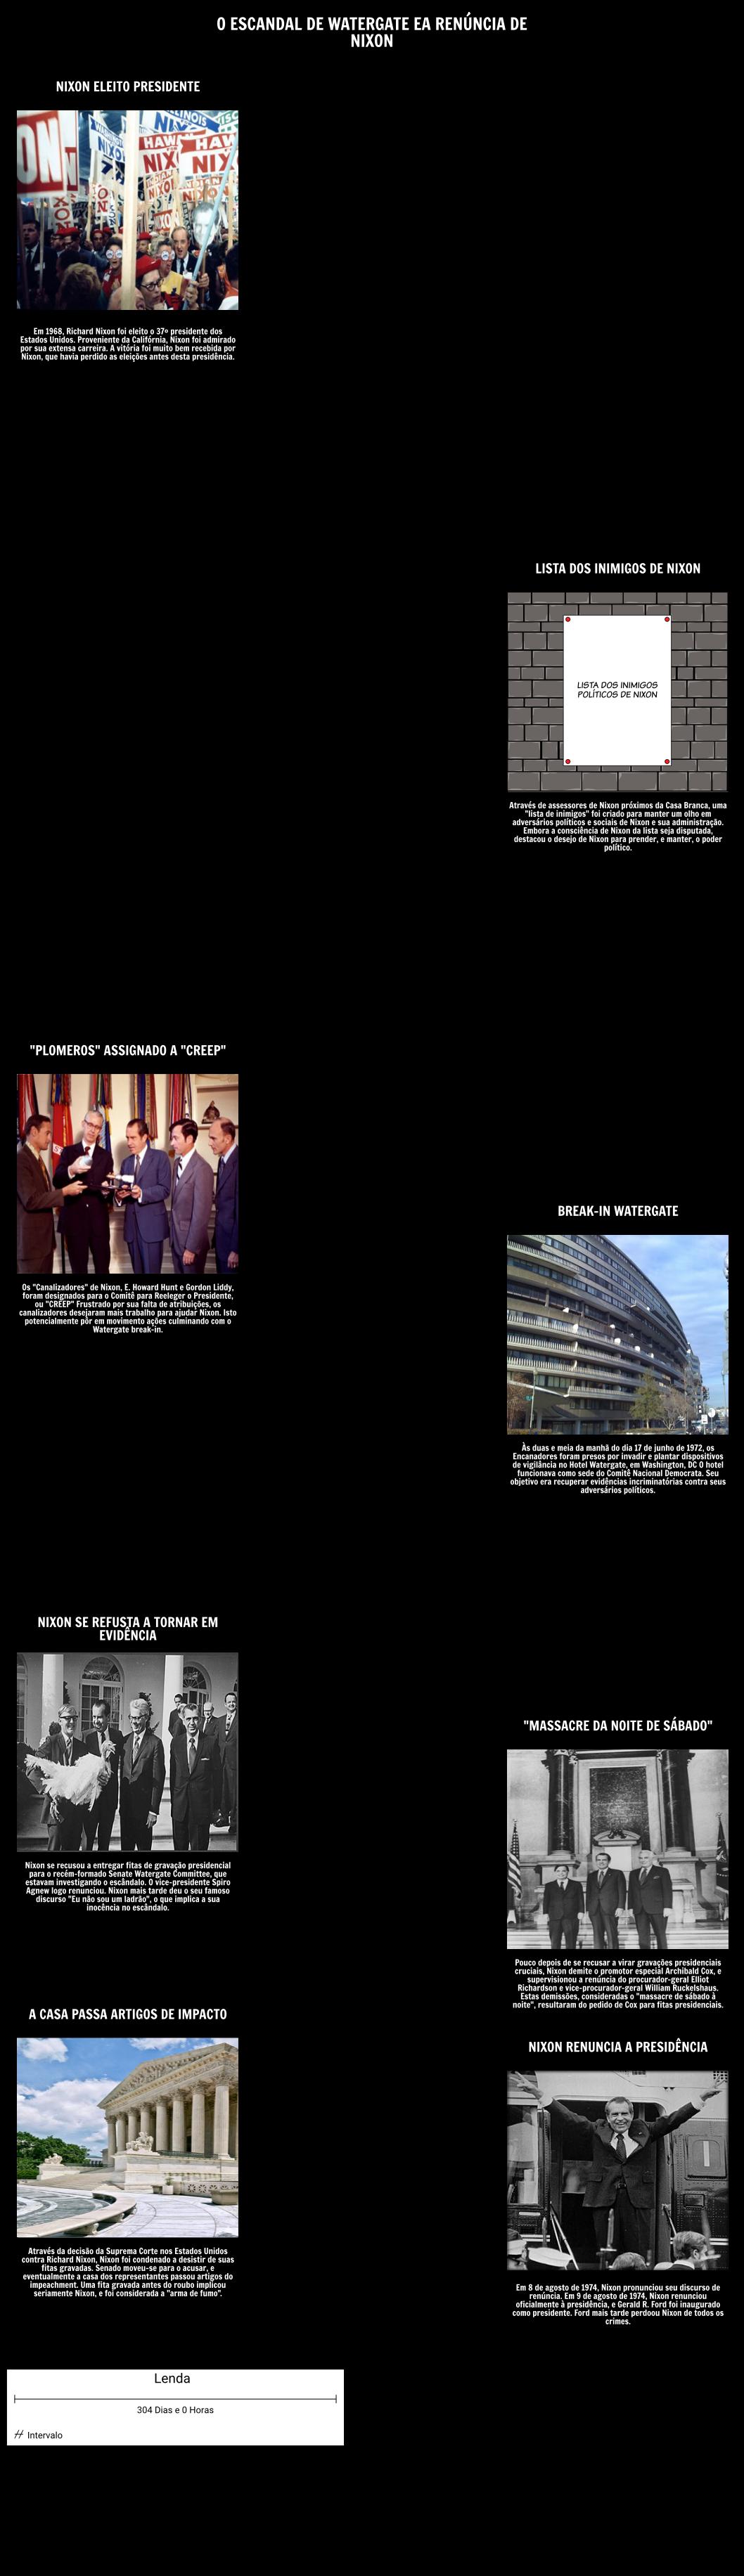 O Cronograma do Escândalo de Watergate e a Renúncia de Nixon